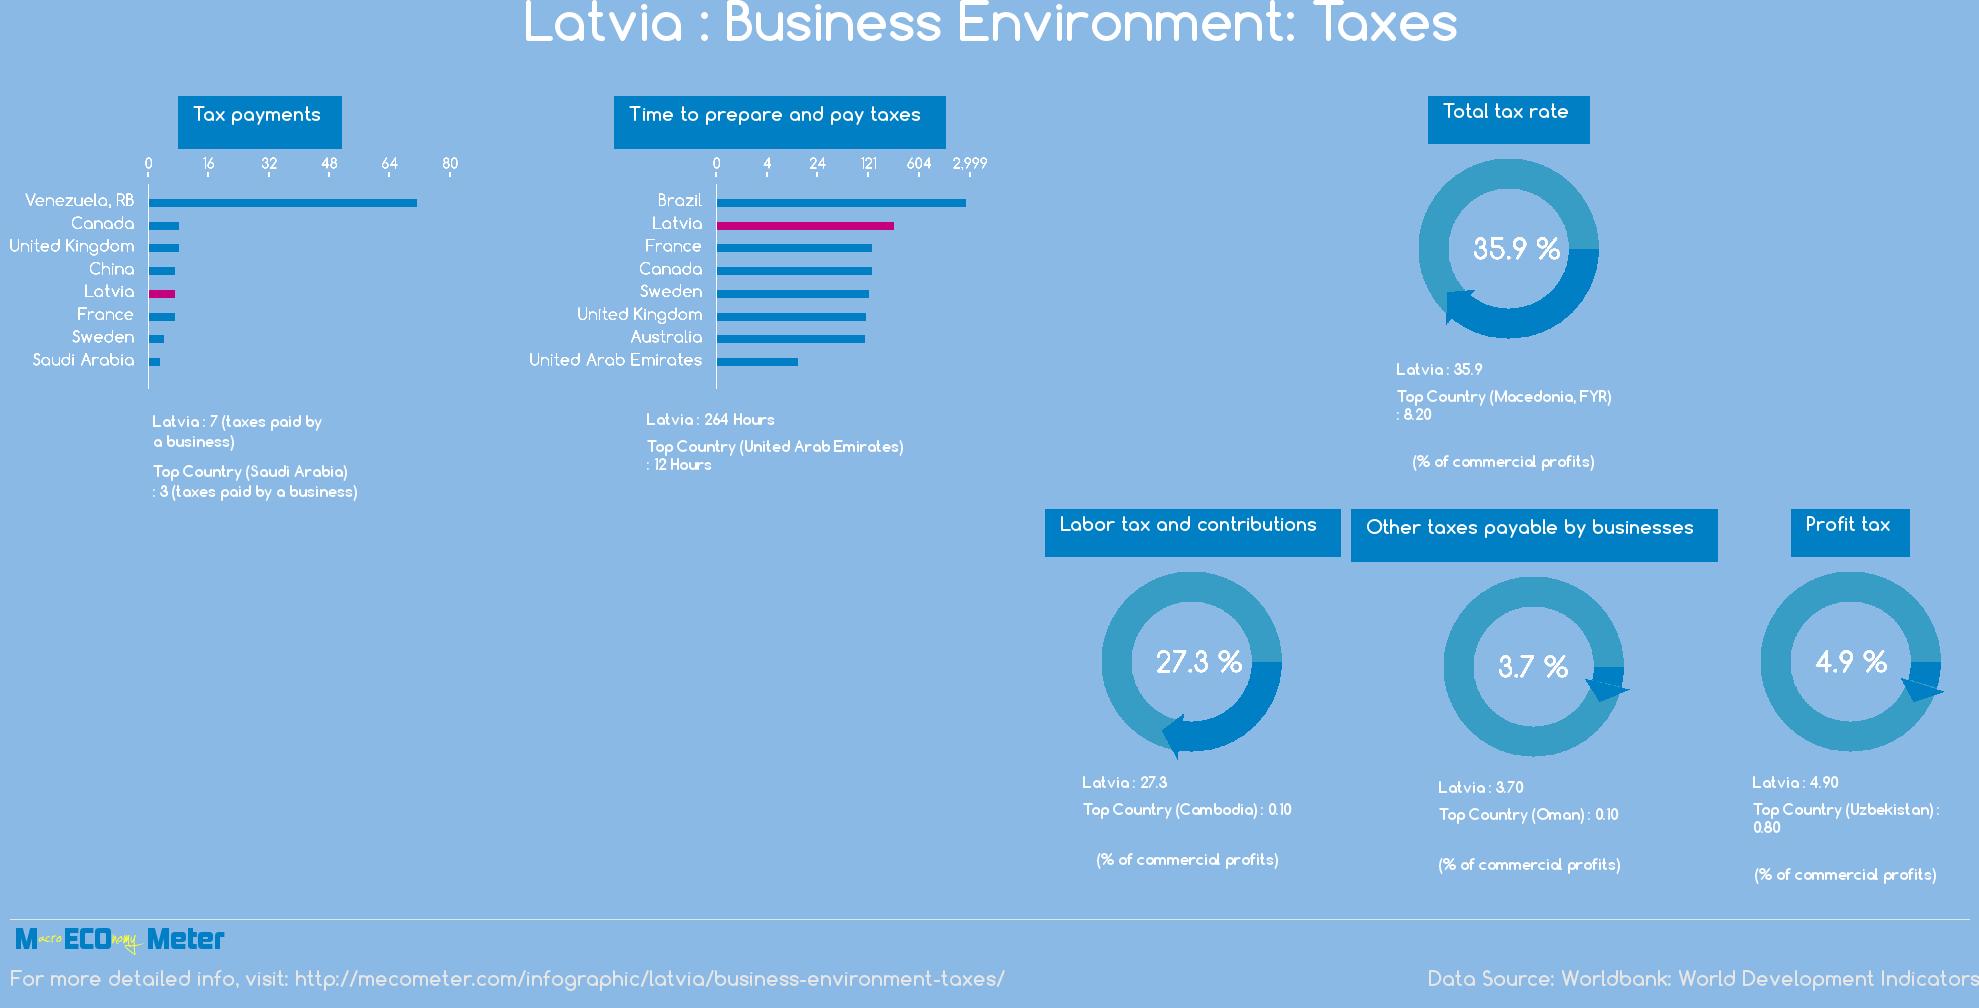 Latvia : Business Environment: Taxes